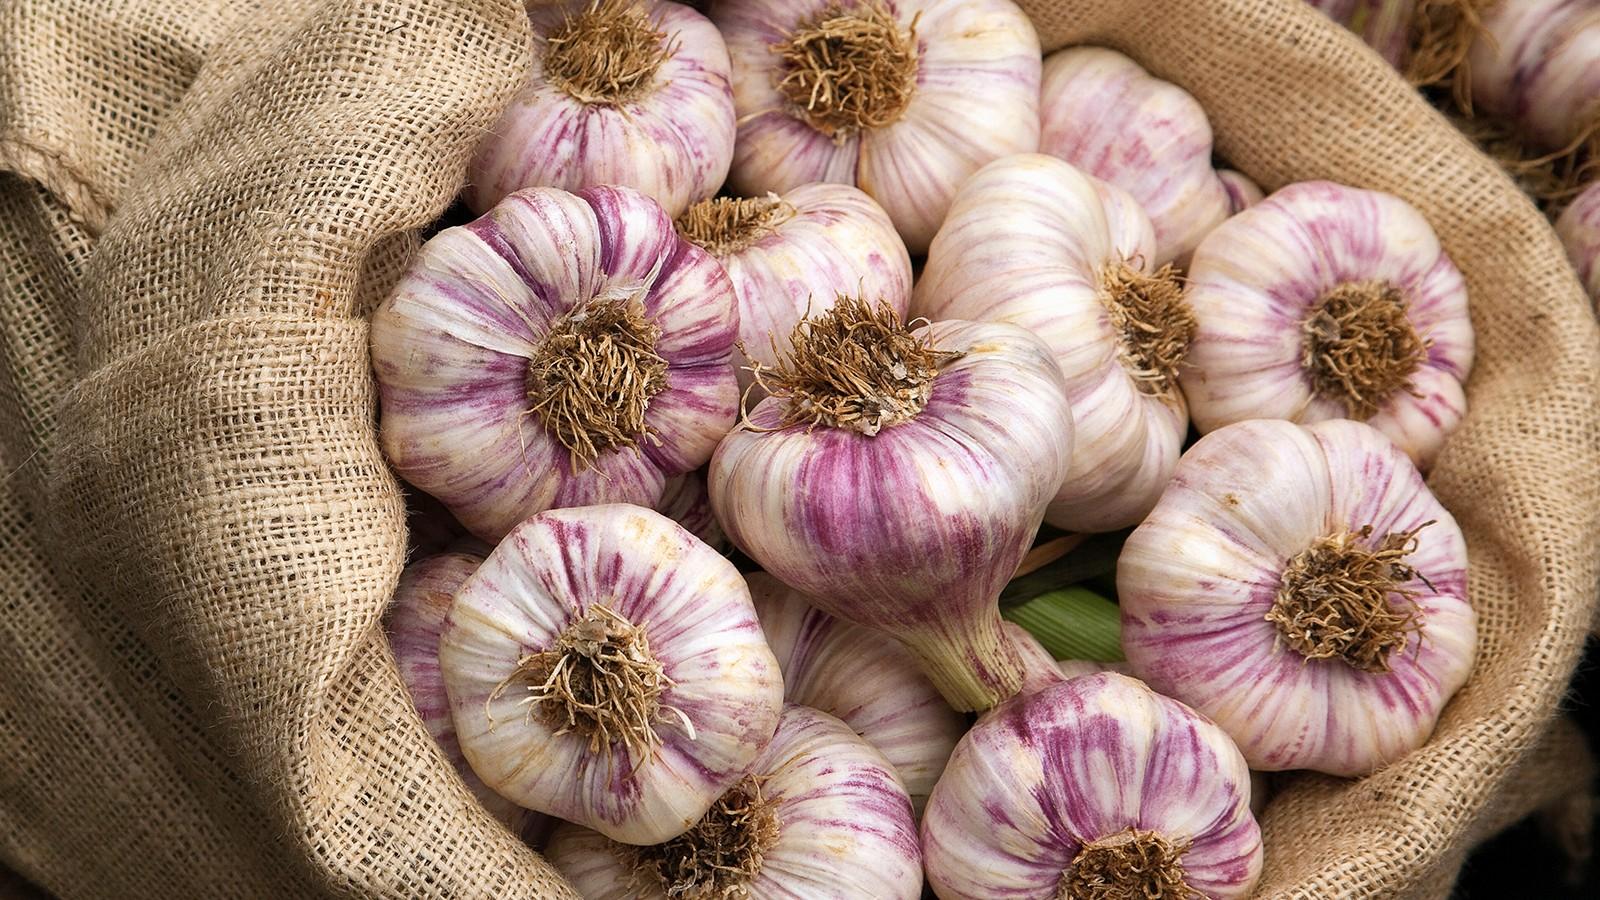 Fresh garlic (Allium sativum) Hampton Court Flower Show 2009